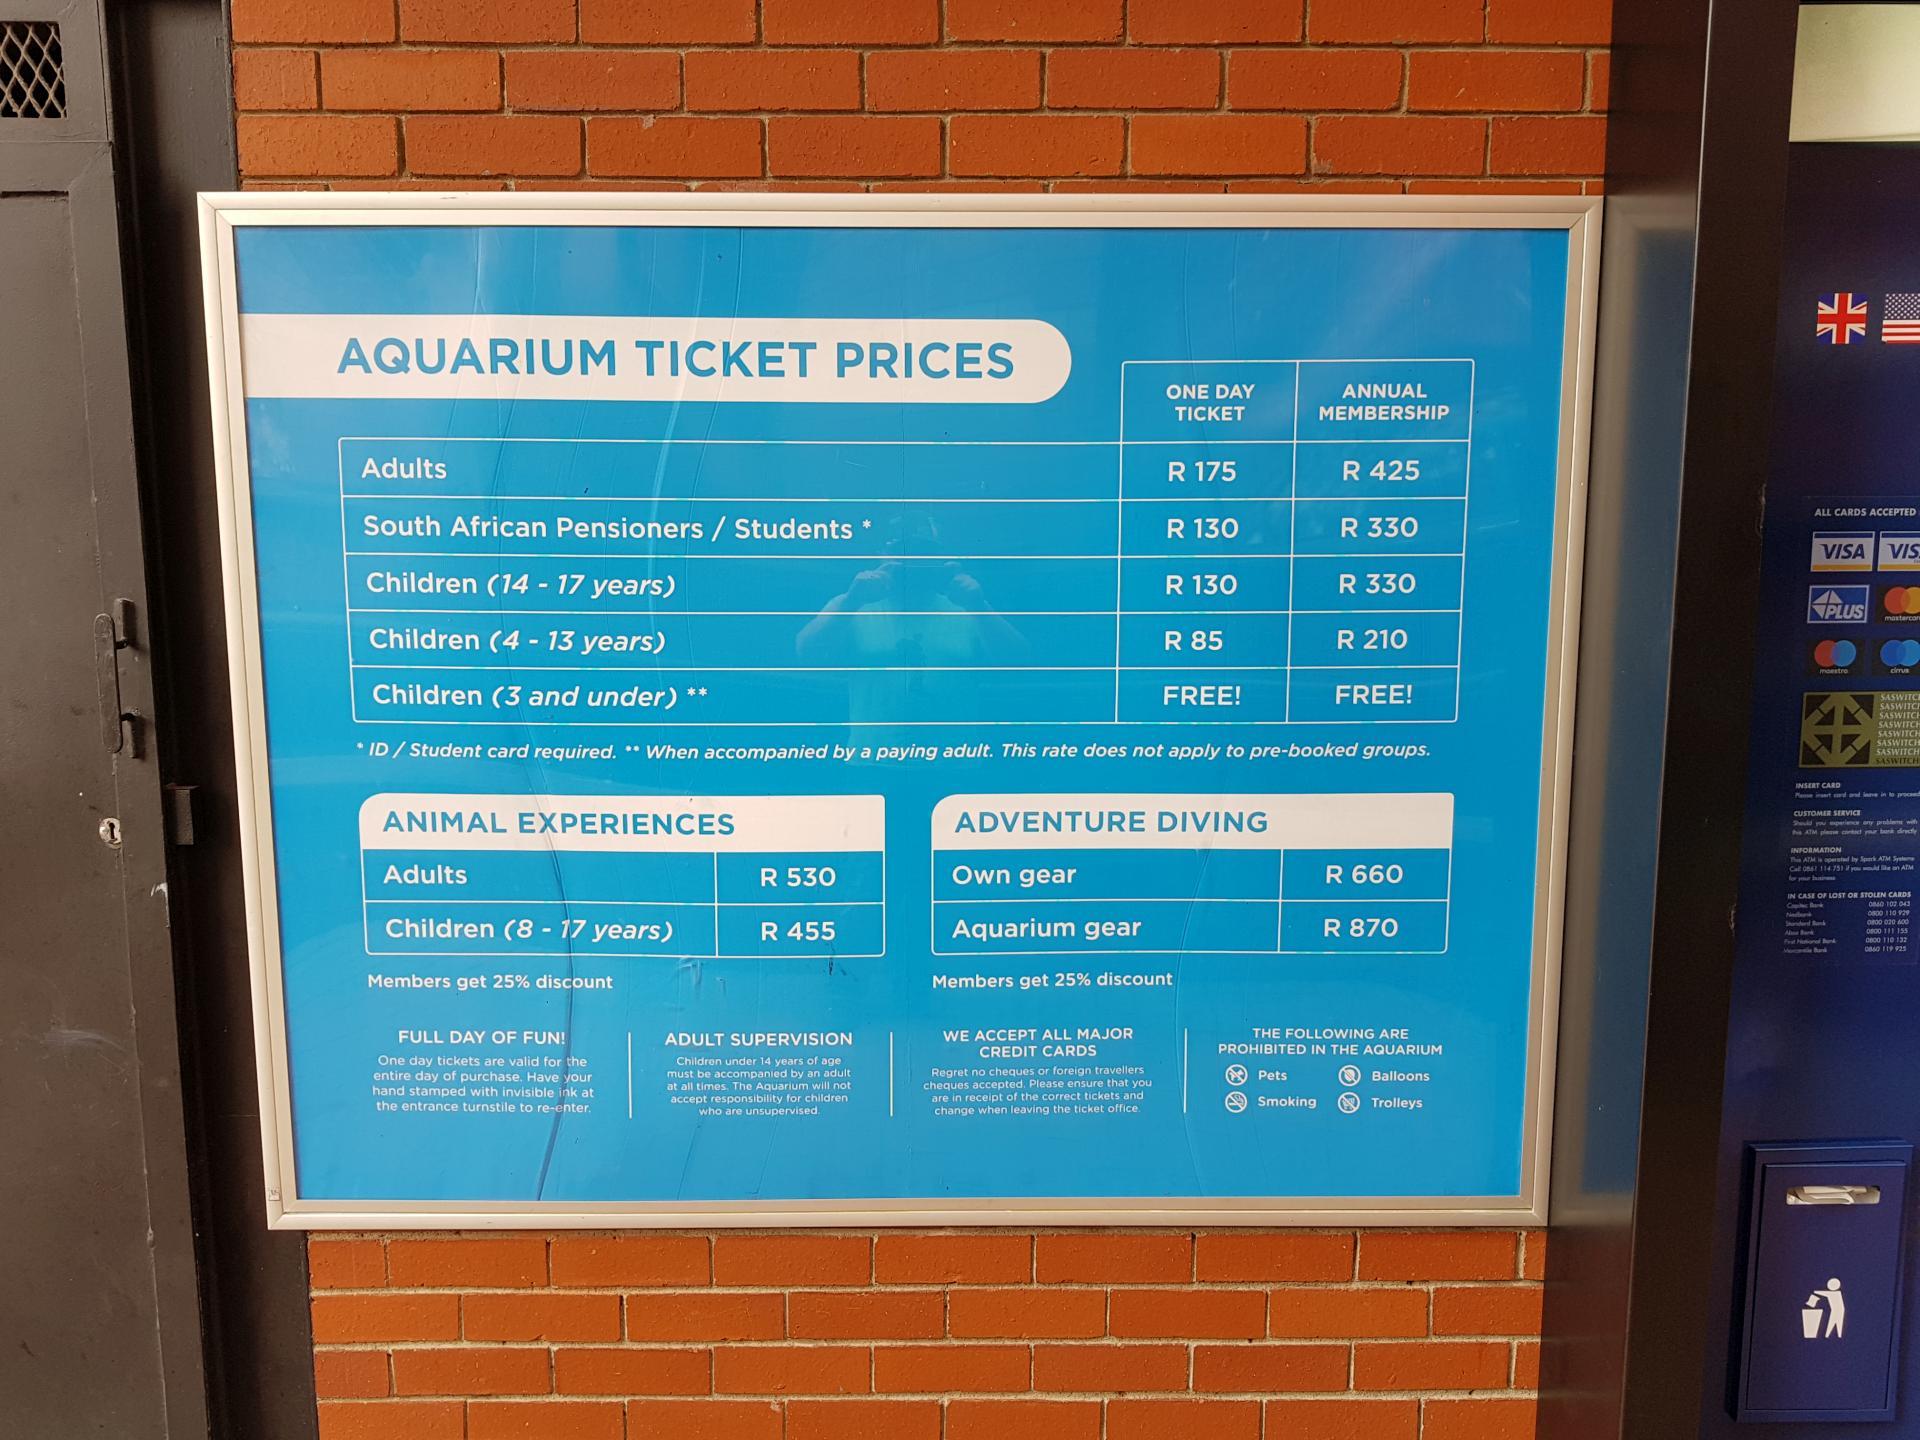 аквариум 2 океана прайс-лист